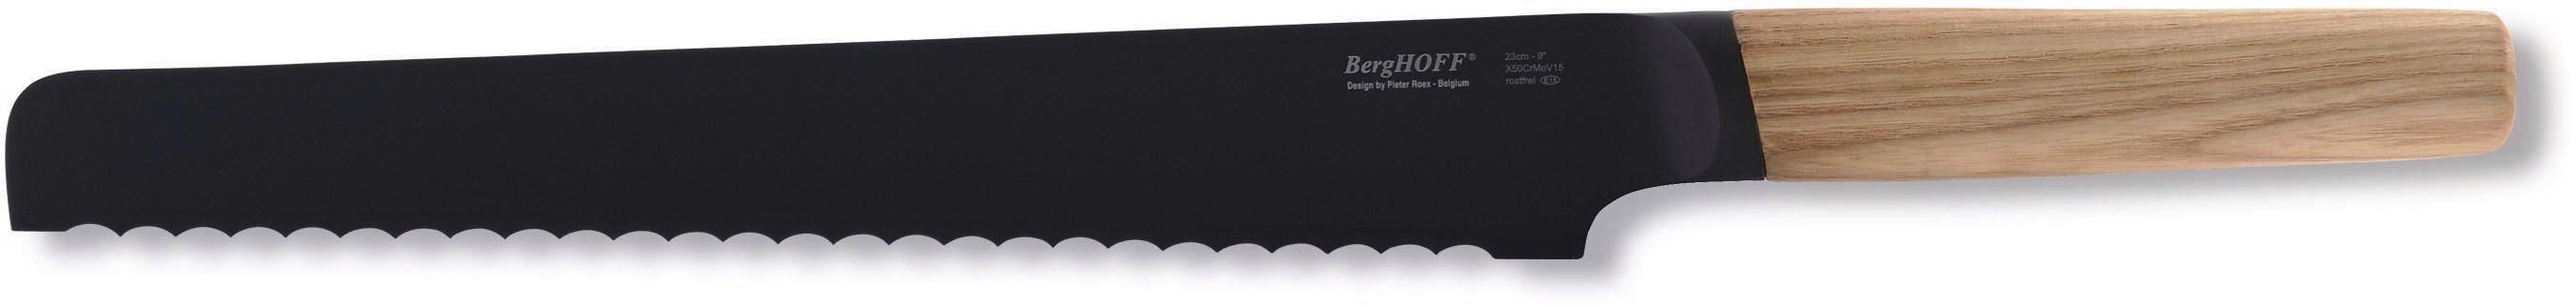 BergHOFF Brotmesser »Ron line«, mit Antihaftbeschichtung